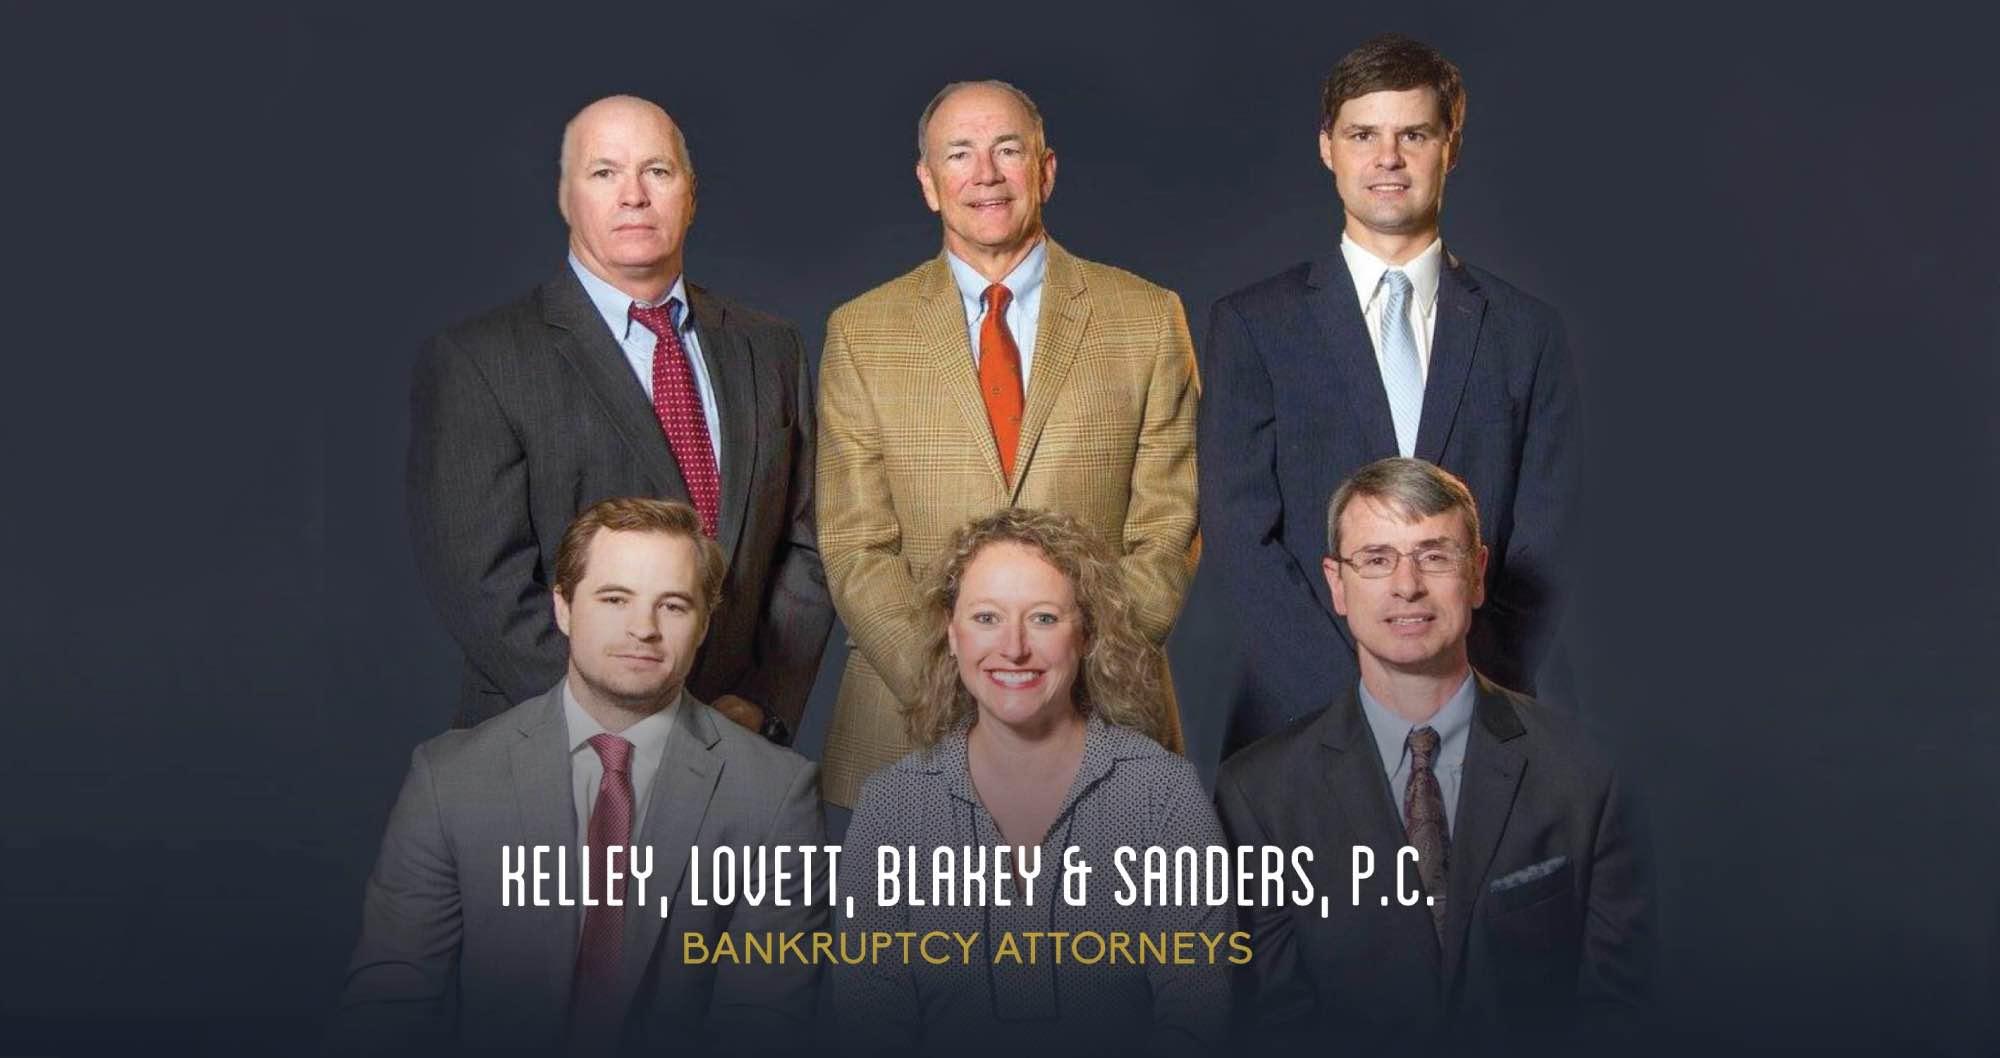 A photo of the team at Kelley, Lovett, Blakey, & Sanders.